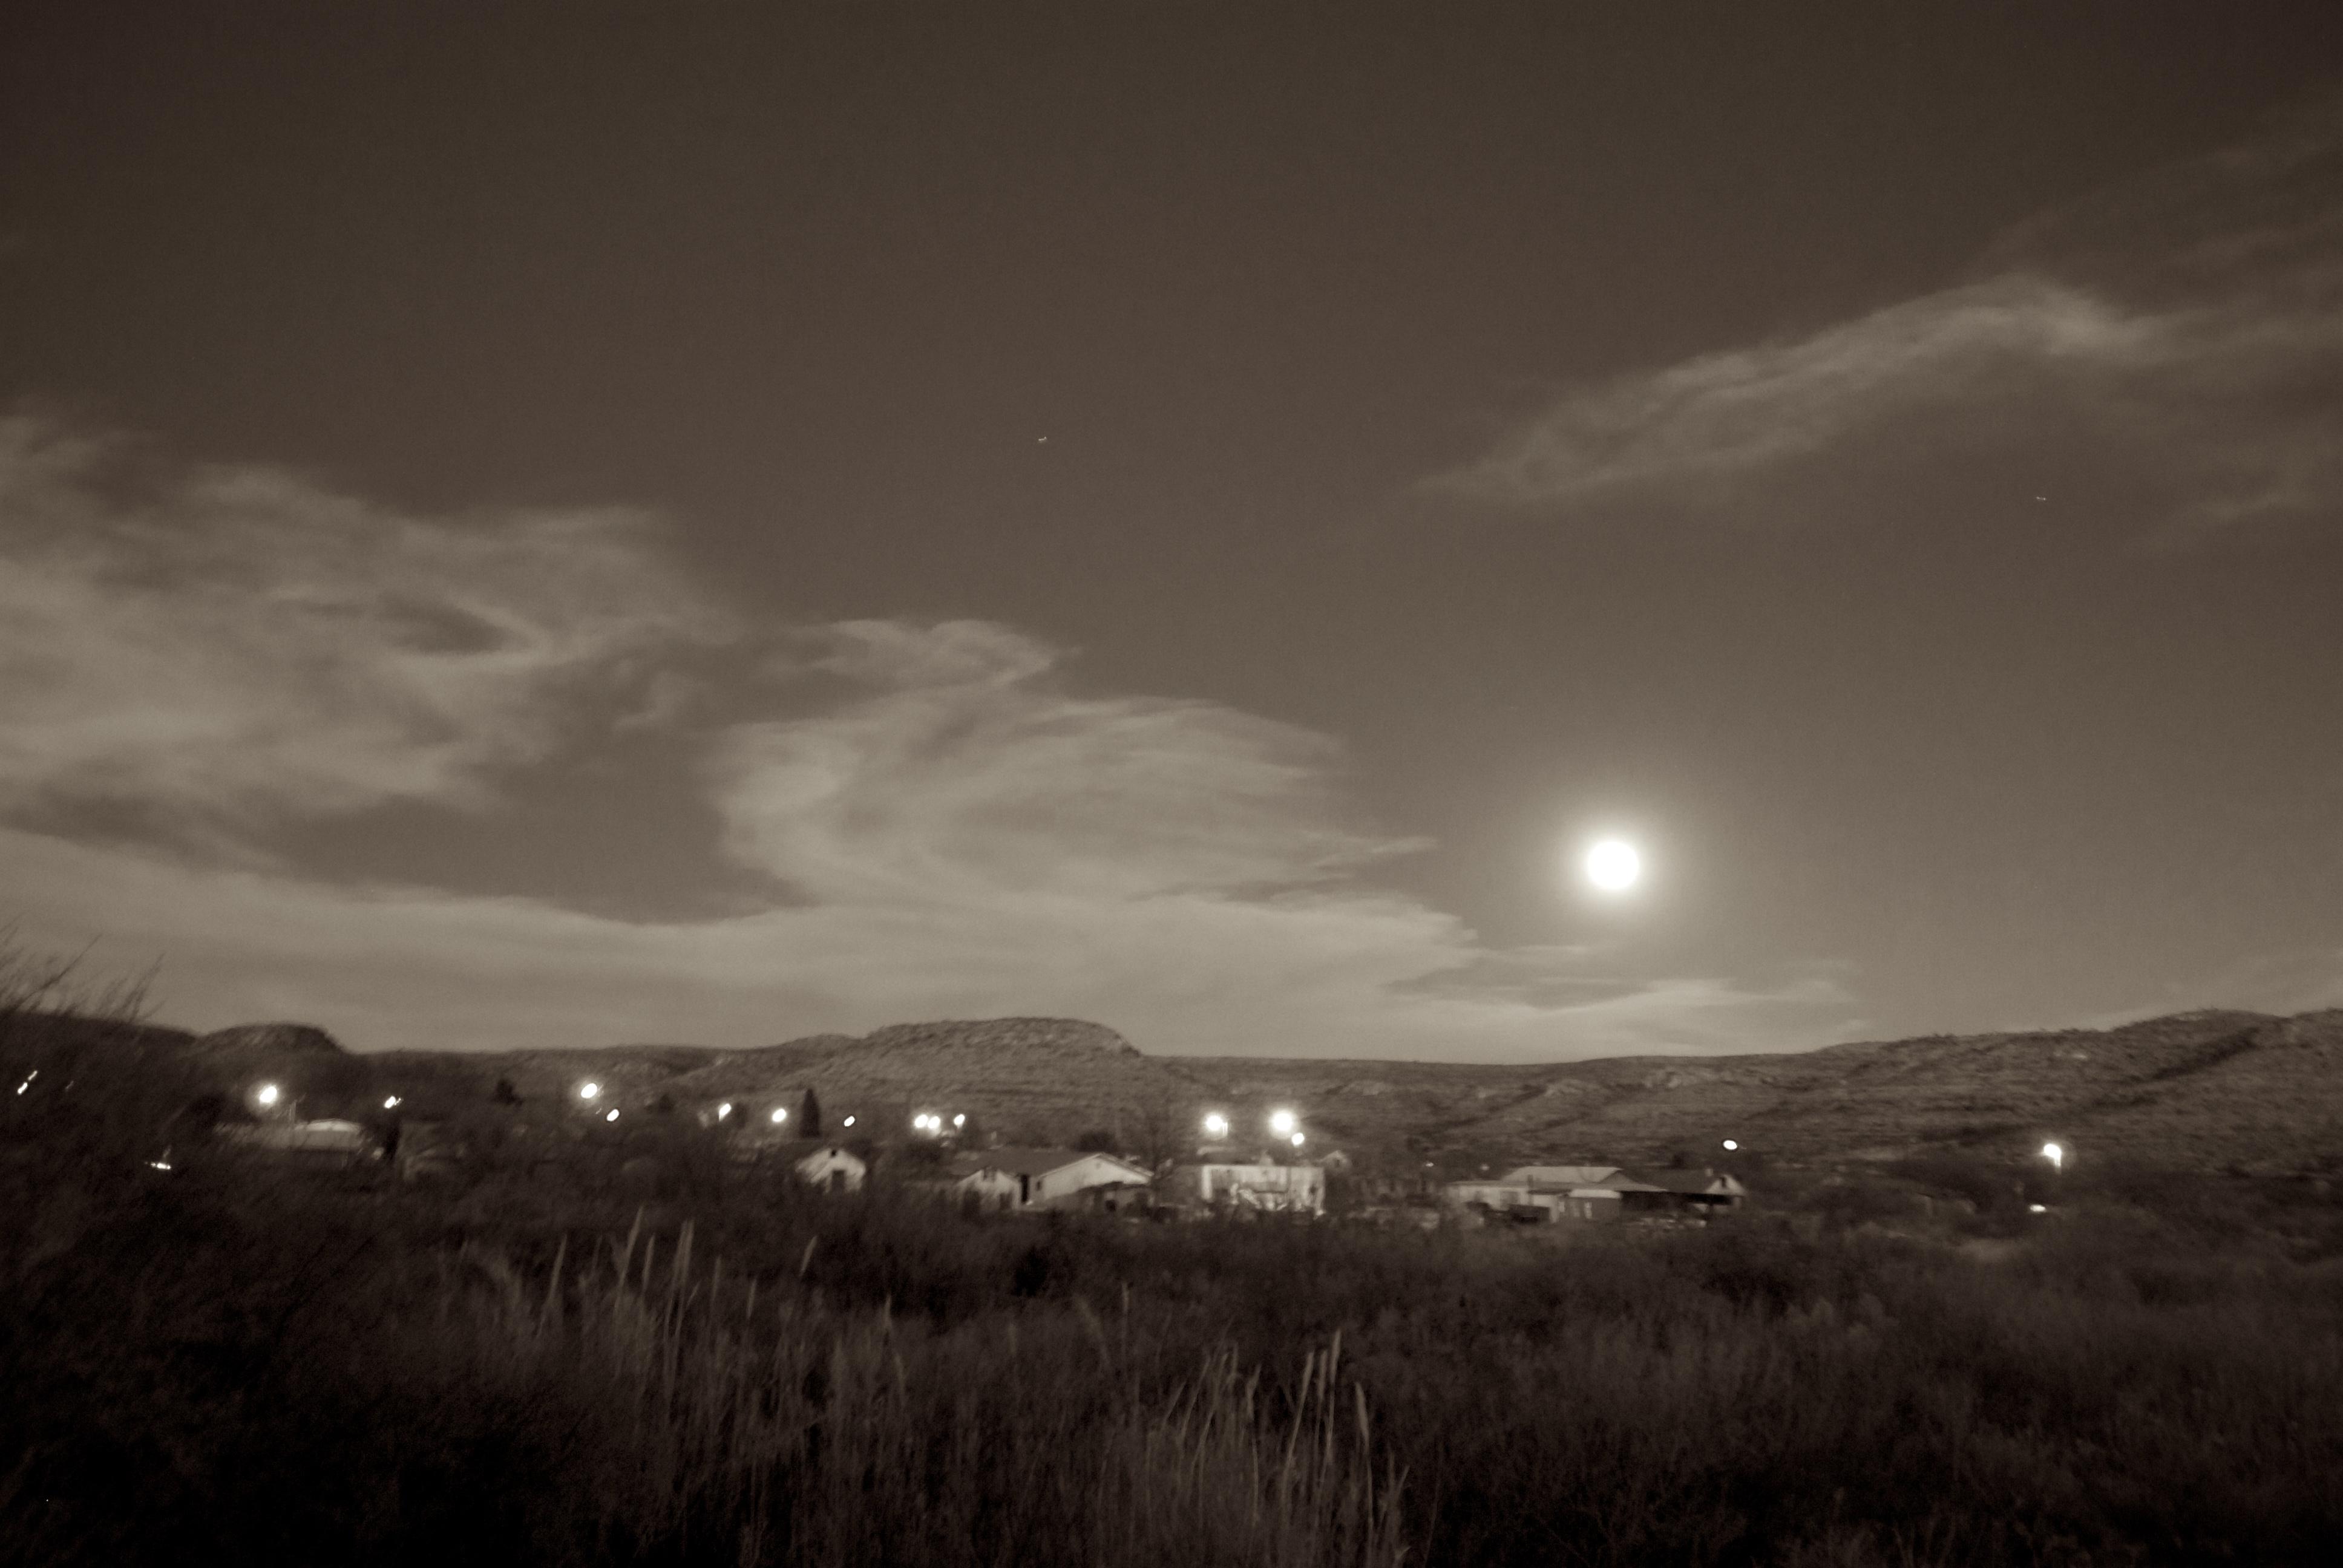 Sanderson Texas 2010 Moonrise Over Sanderson Homage To Ansel